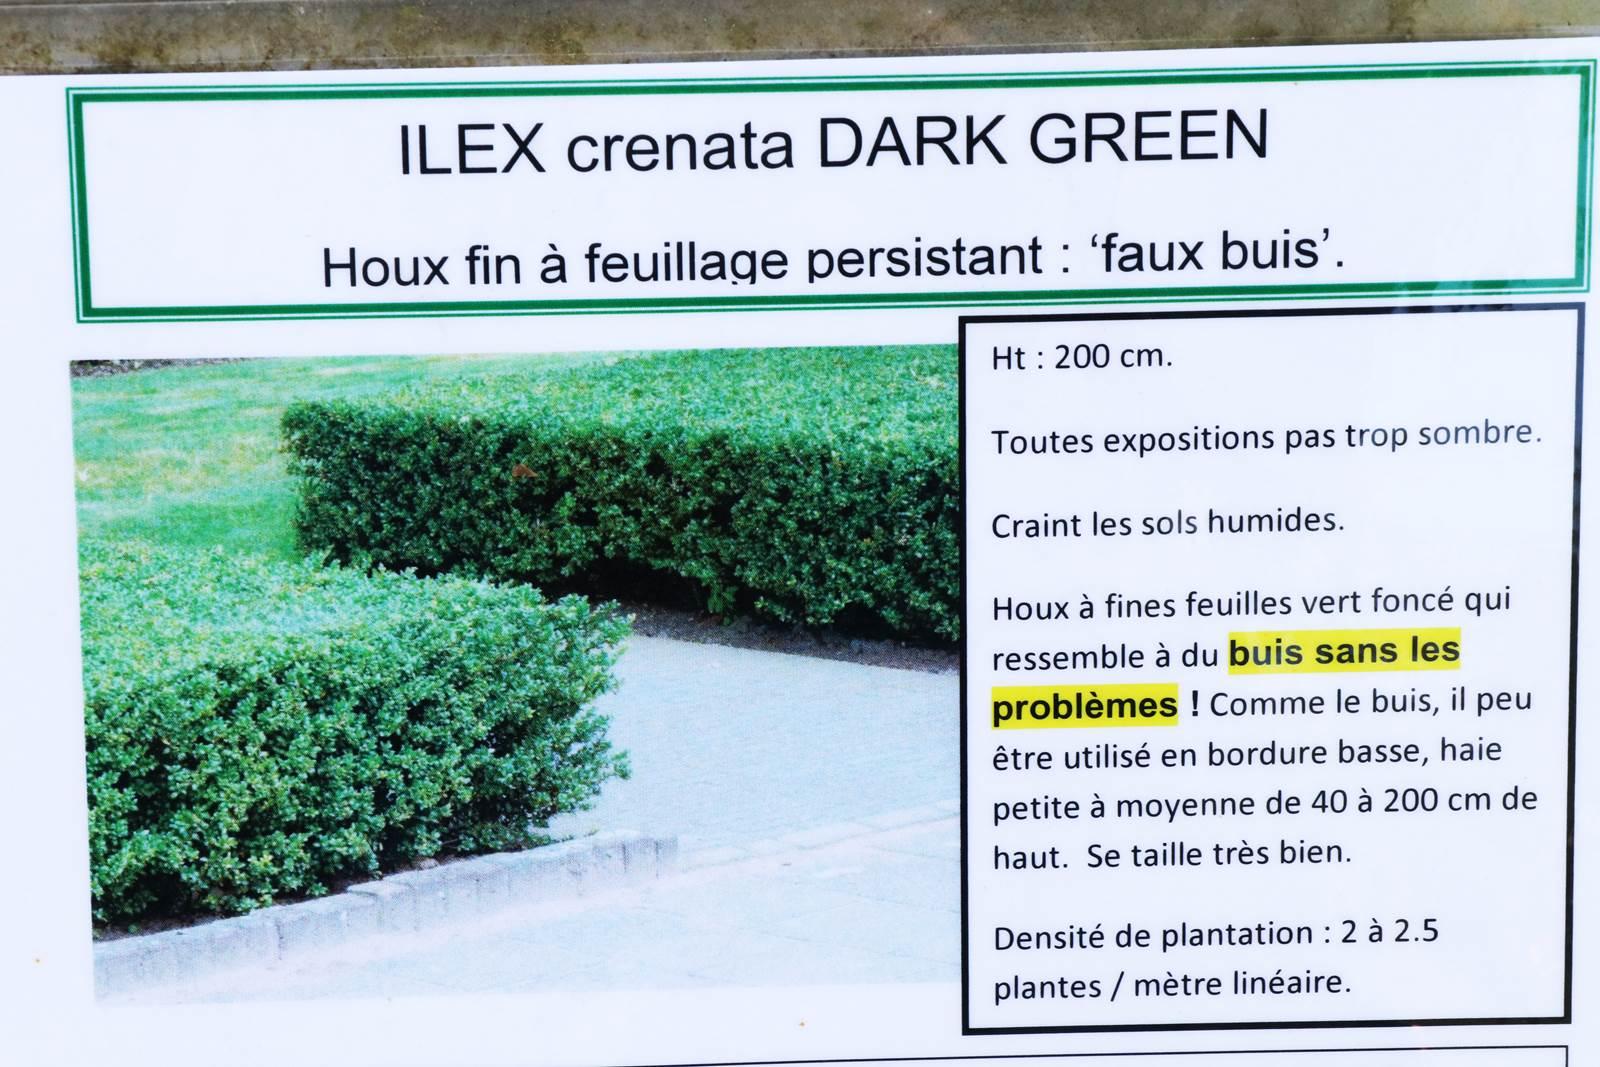 Ilex crenata